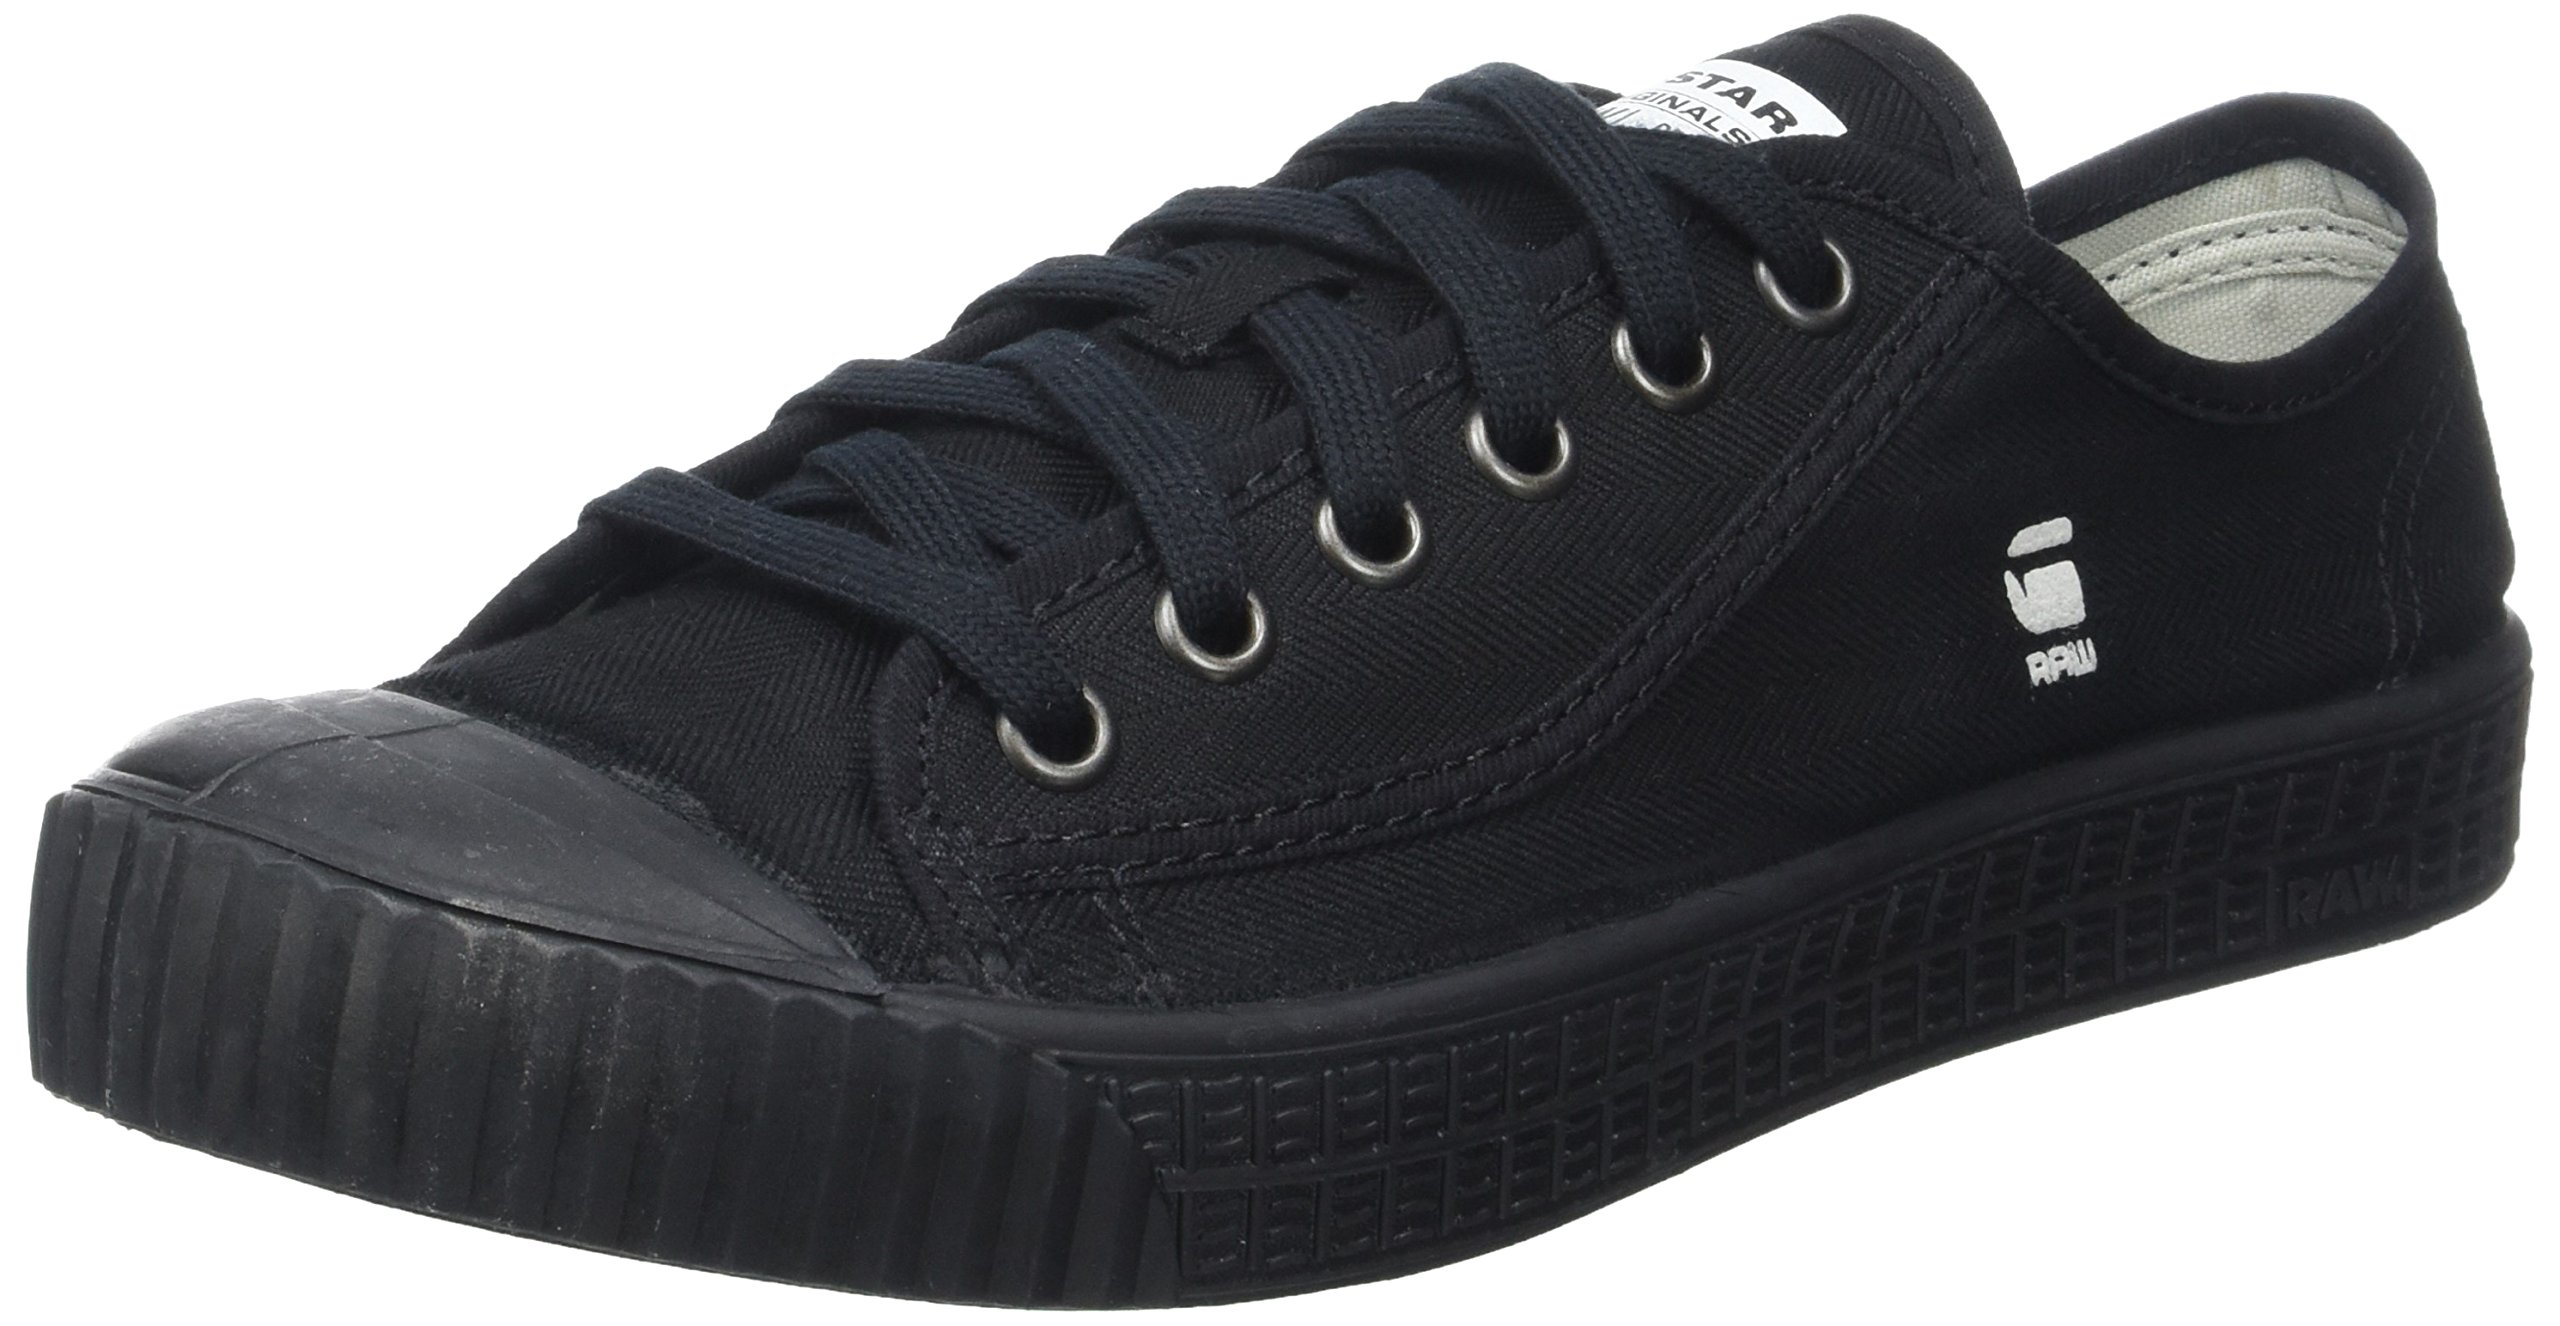 Denim Eu star Raw HommeNoirblack Low 99041 Rovulc SneakersBasses G vNwmn08